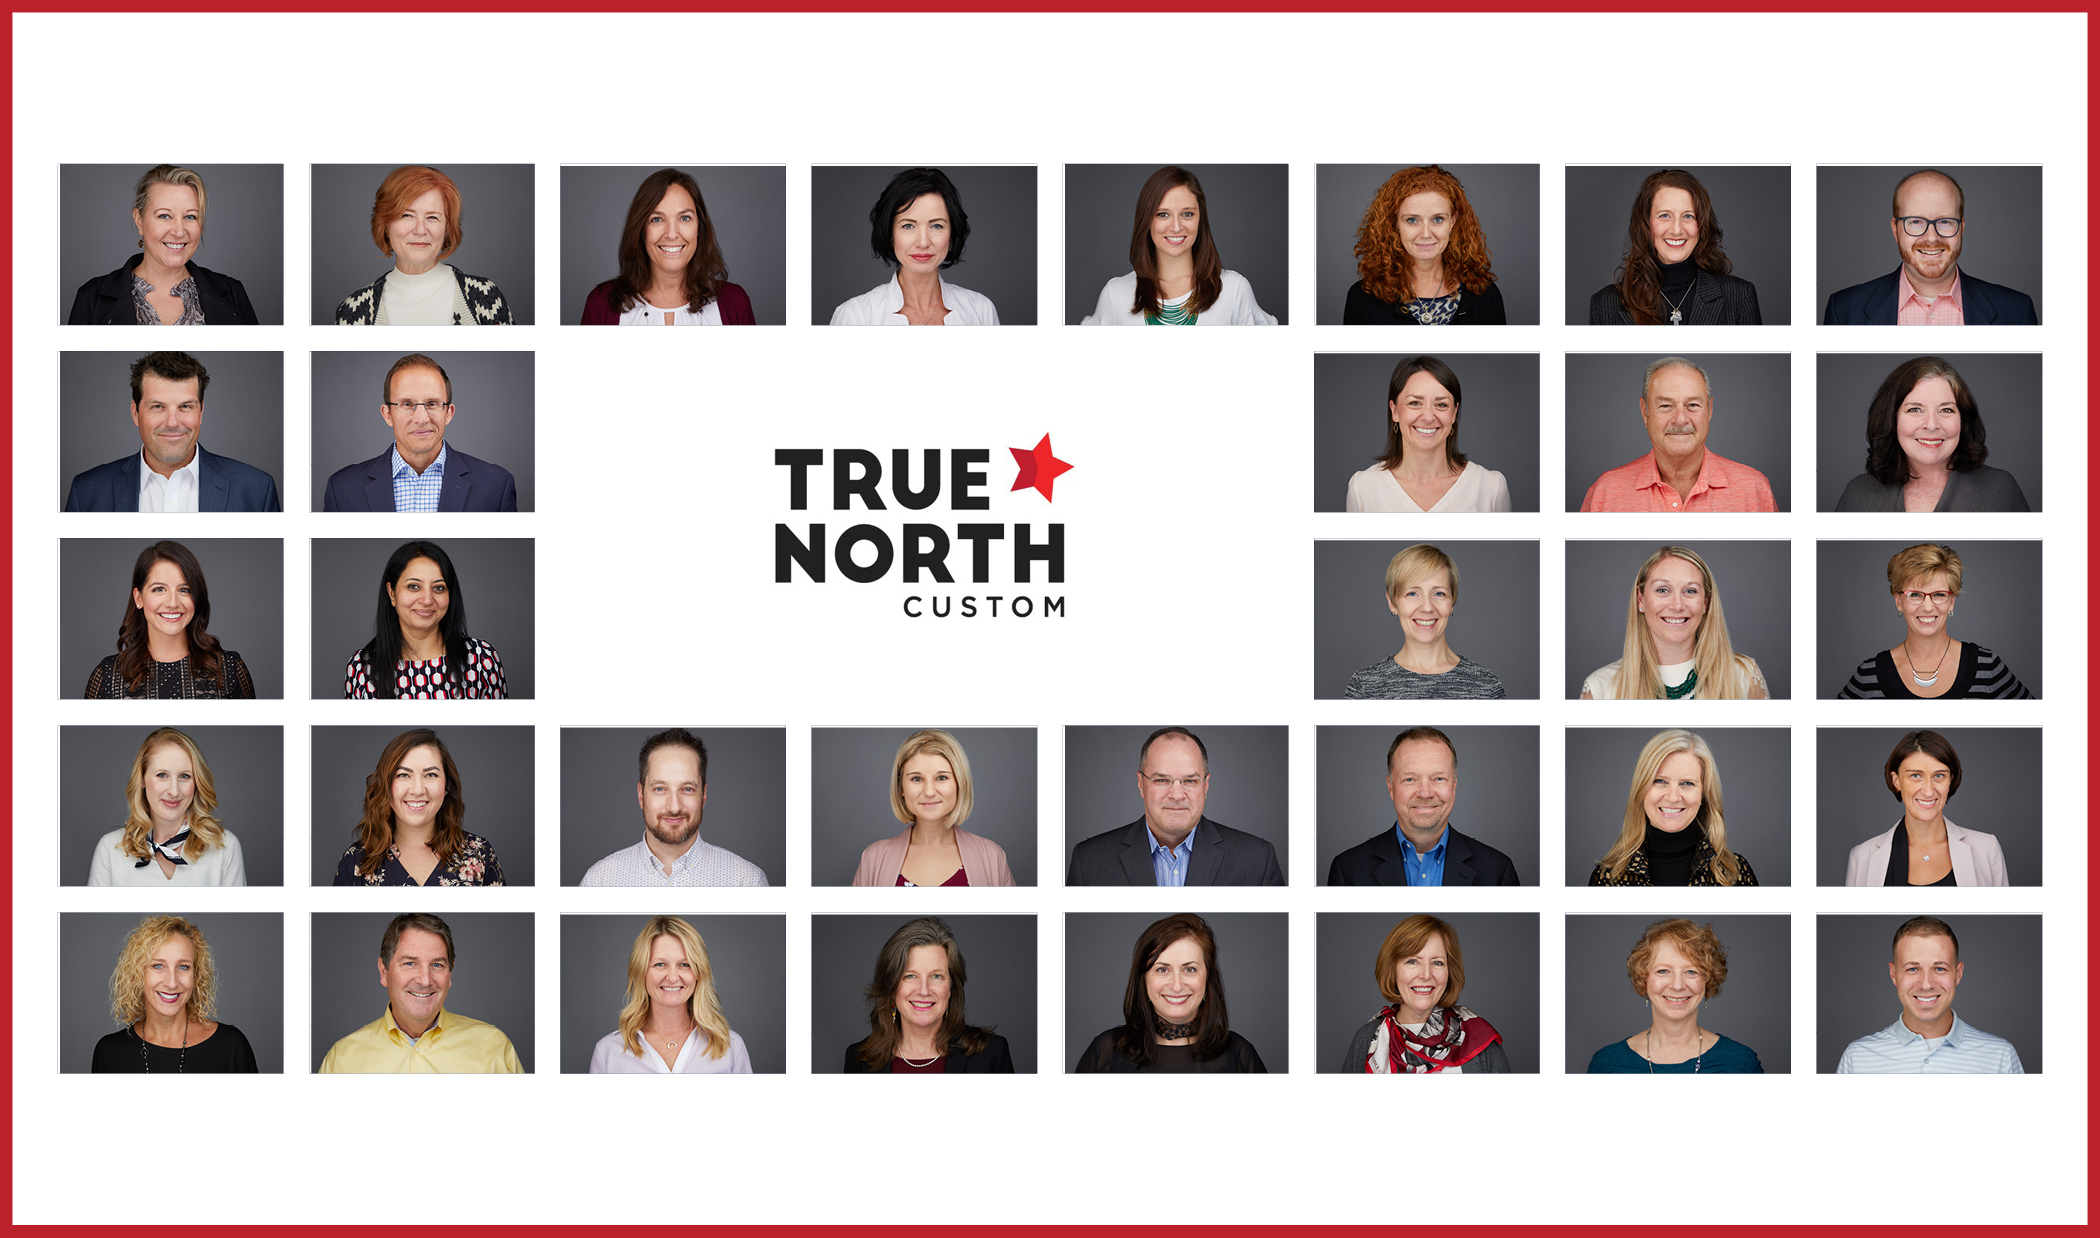 True North Headshot Grid